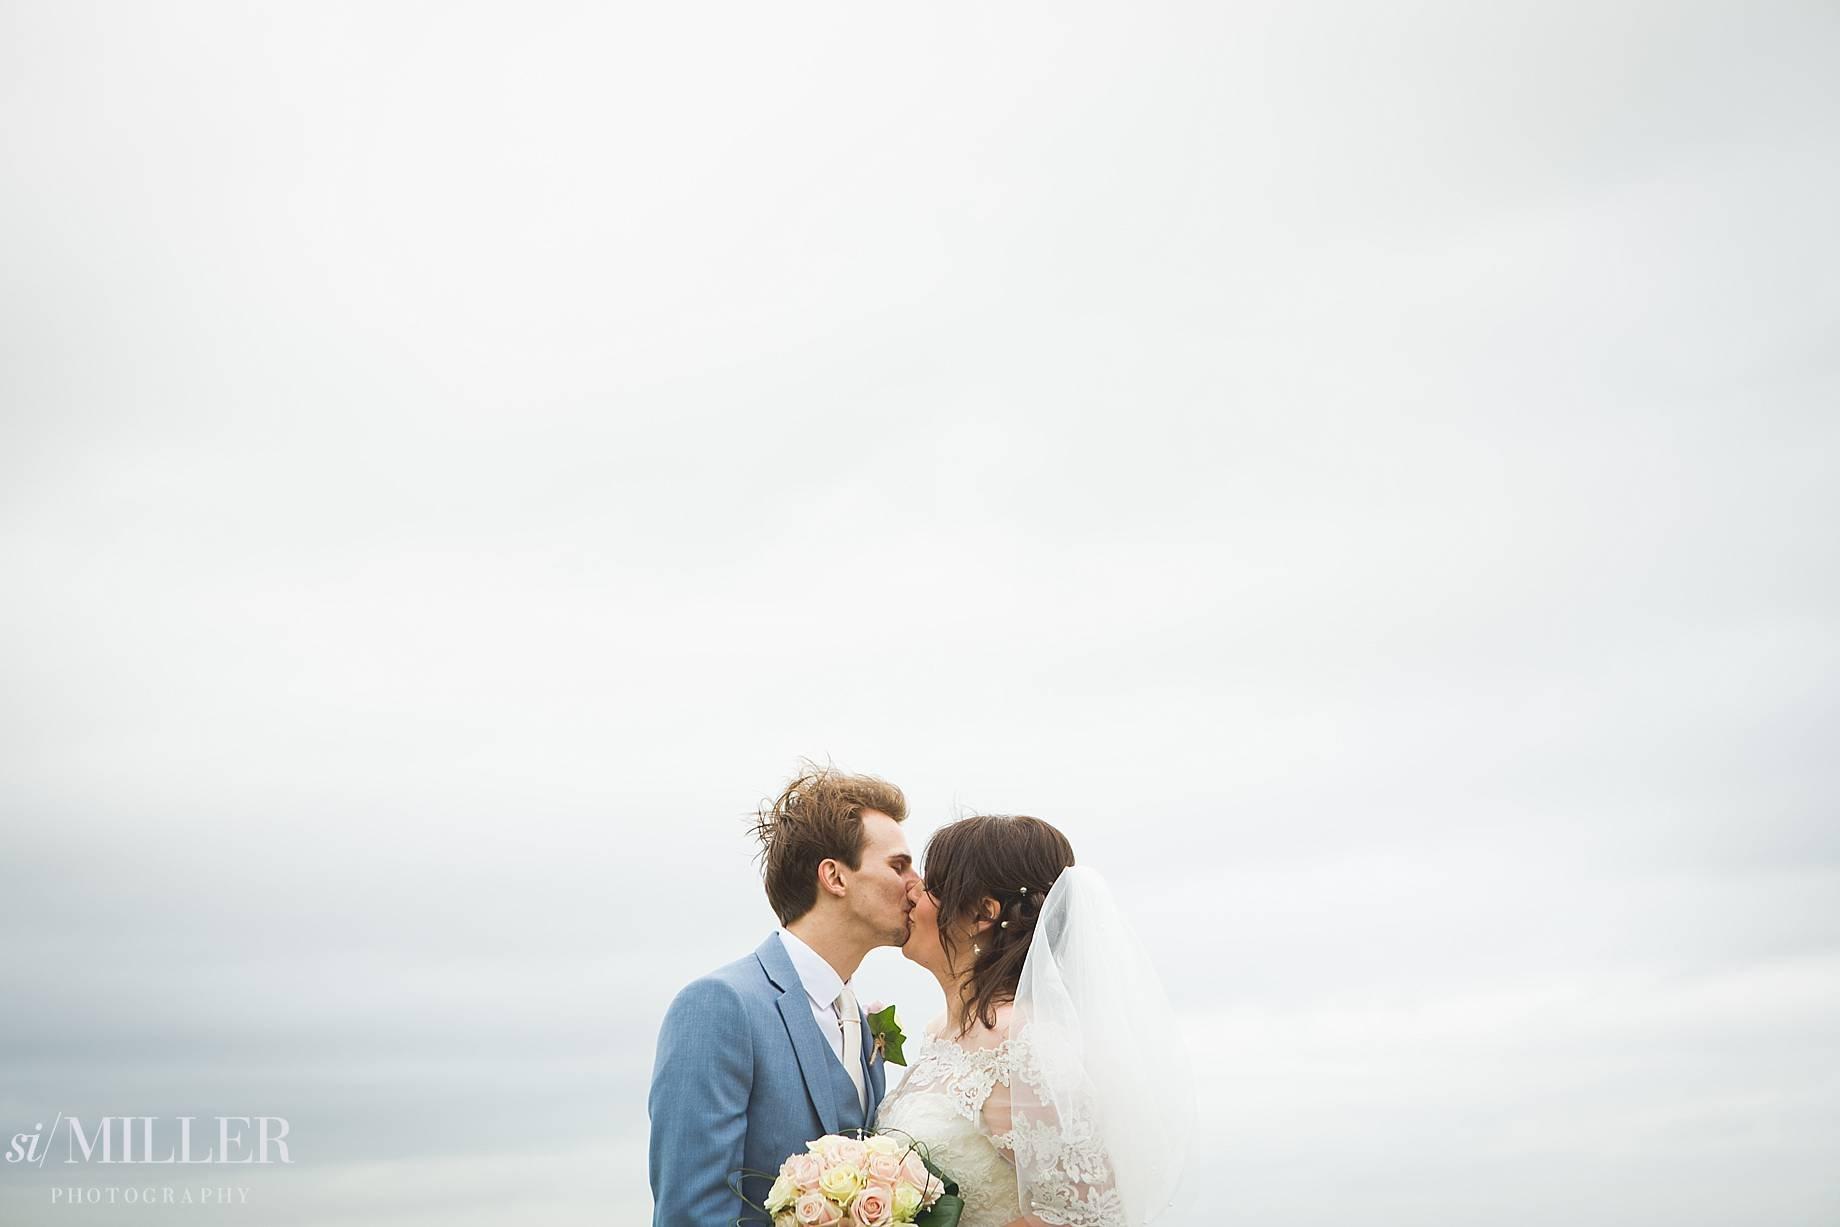 K+M Beeston Manor Wedding Photography